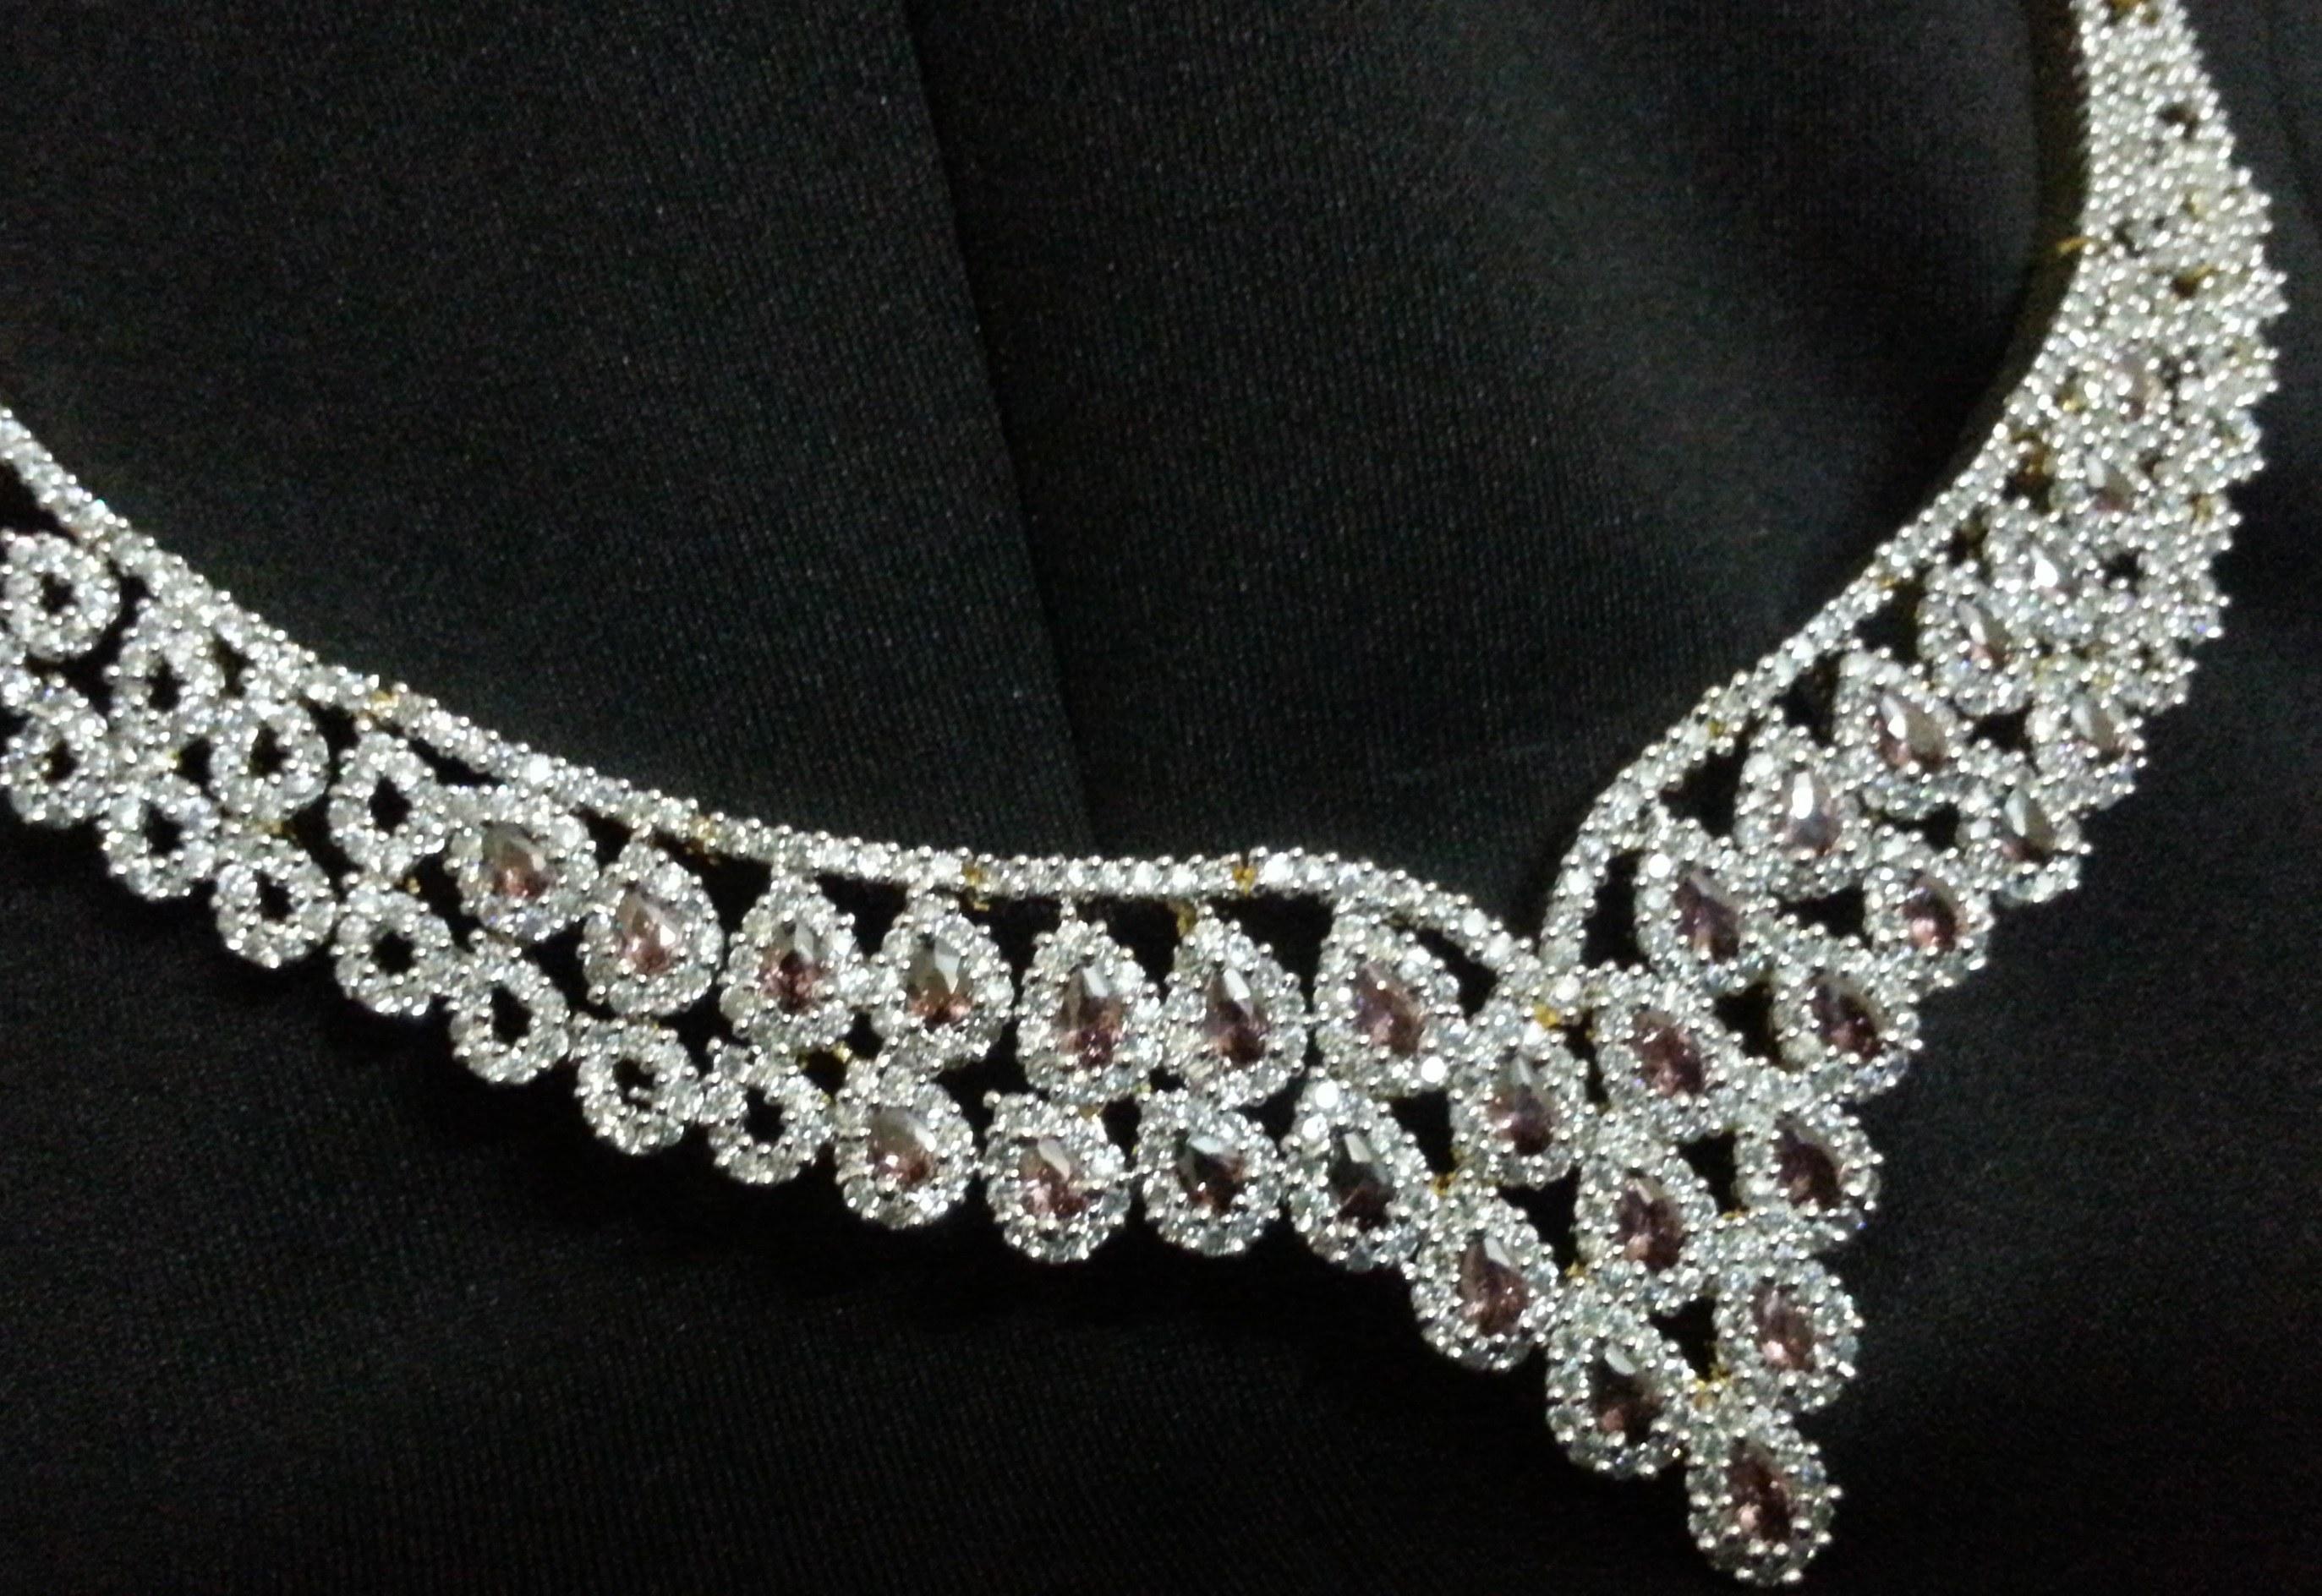 Diamond pendant online shopping india